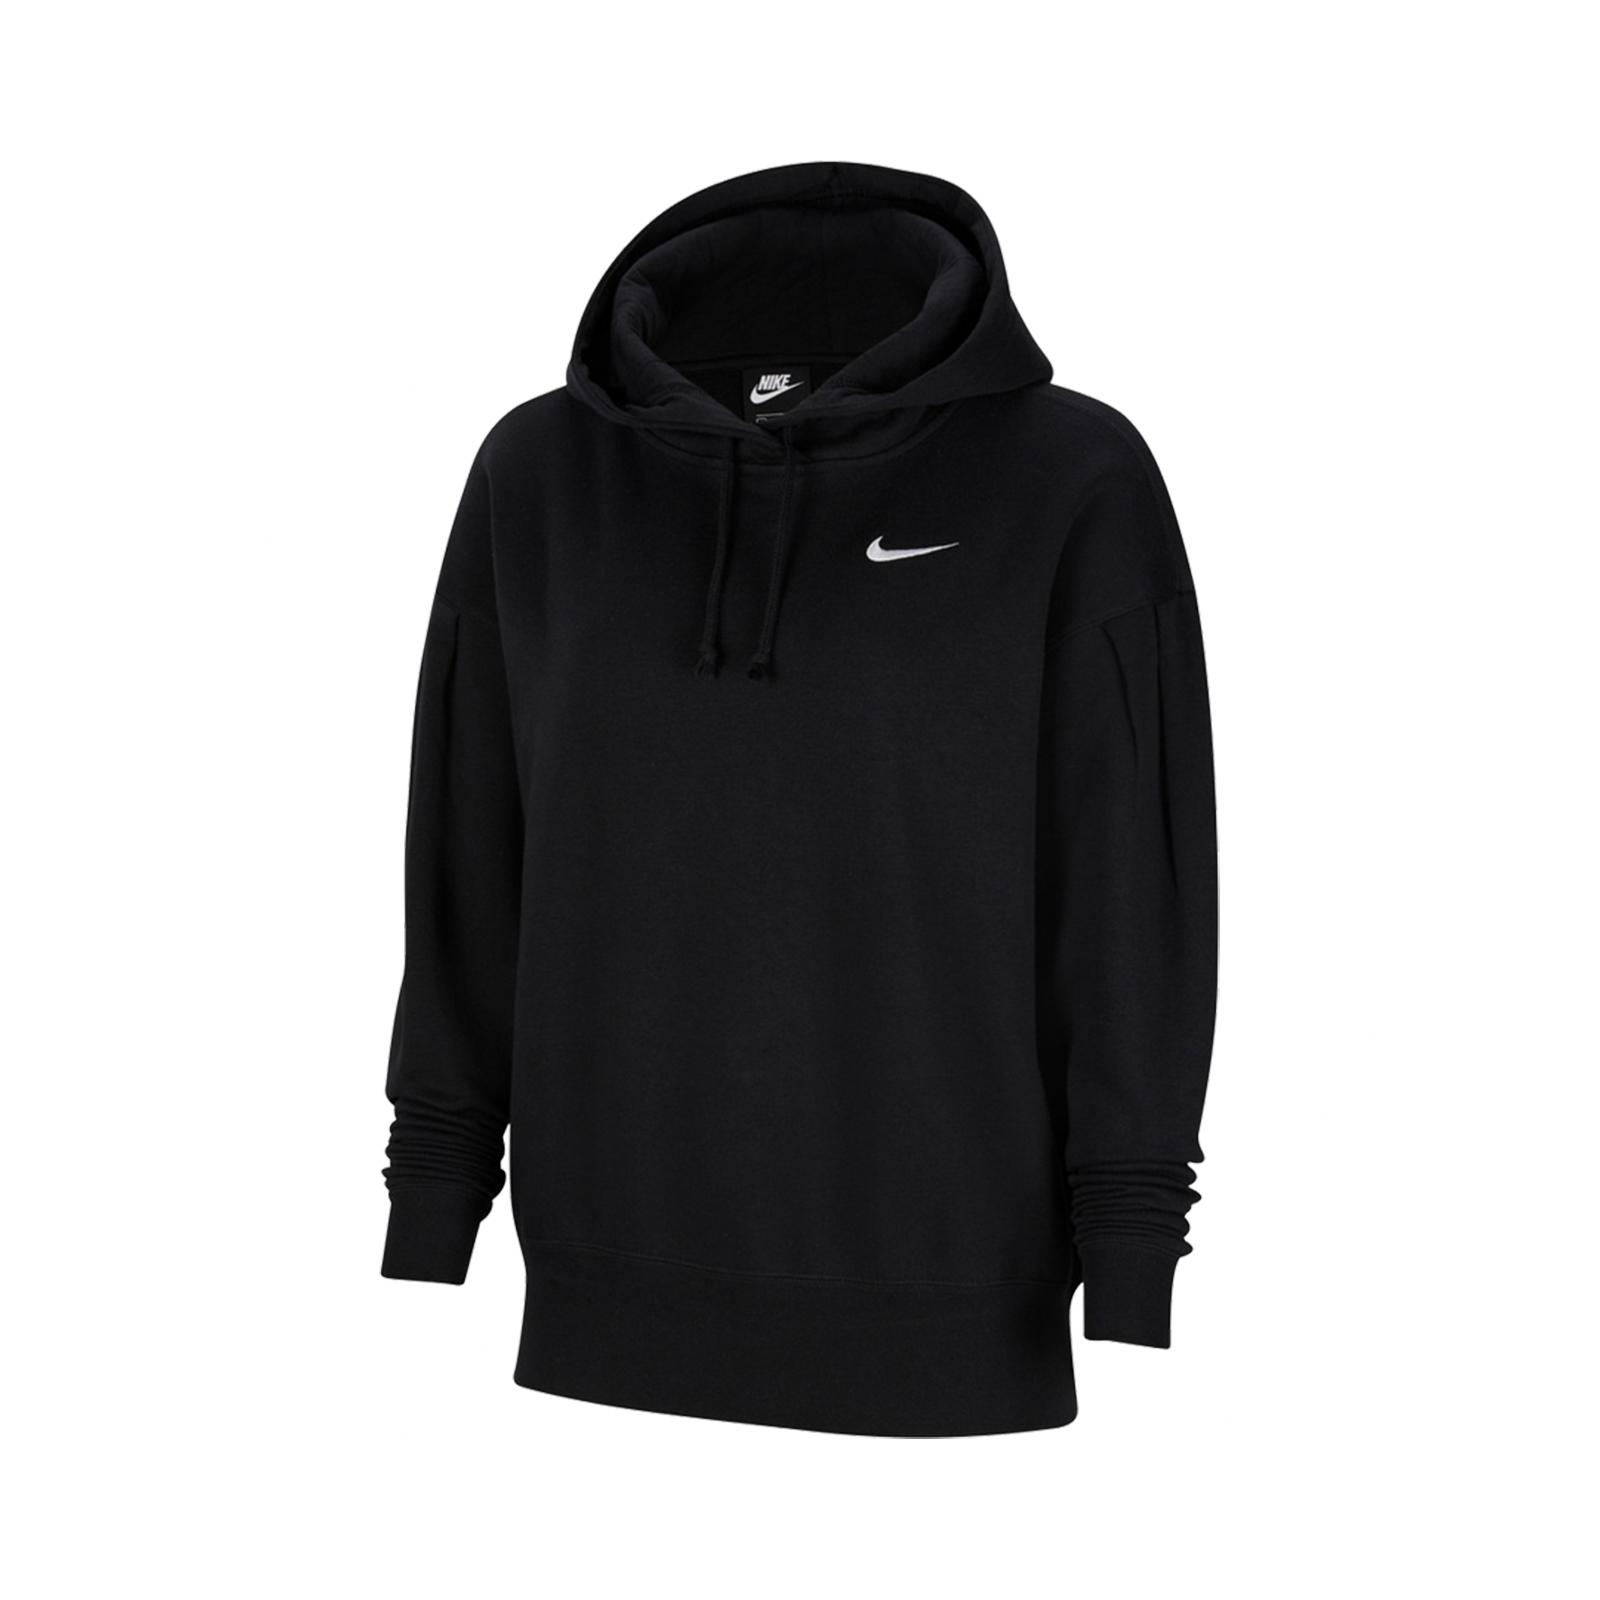 Nike 長袖T恤 NSW Fleece Hoodie 黑 女款 帽T 刷毛 連帽【ACS】 CZ2591-010